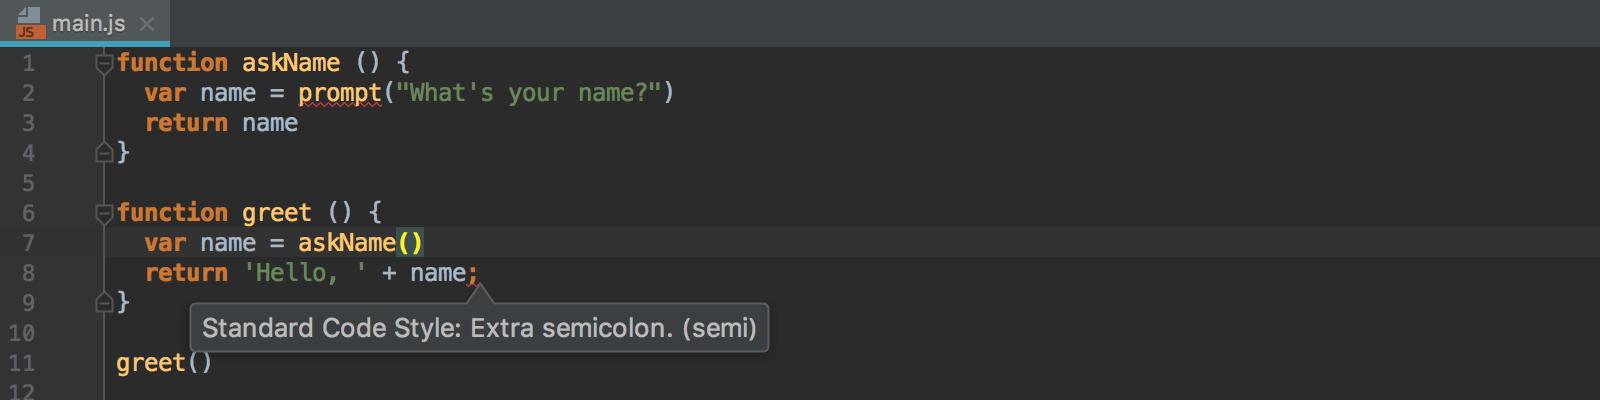 error-from-standard